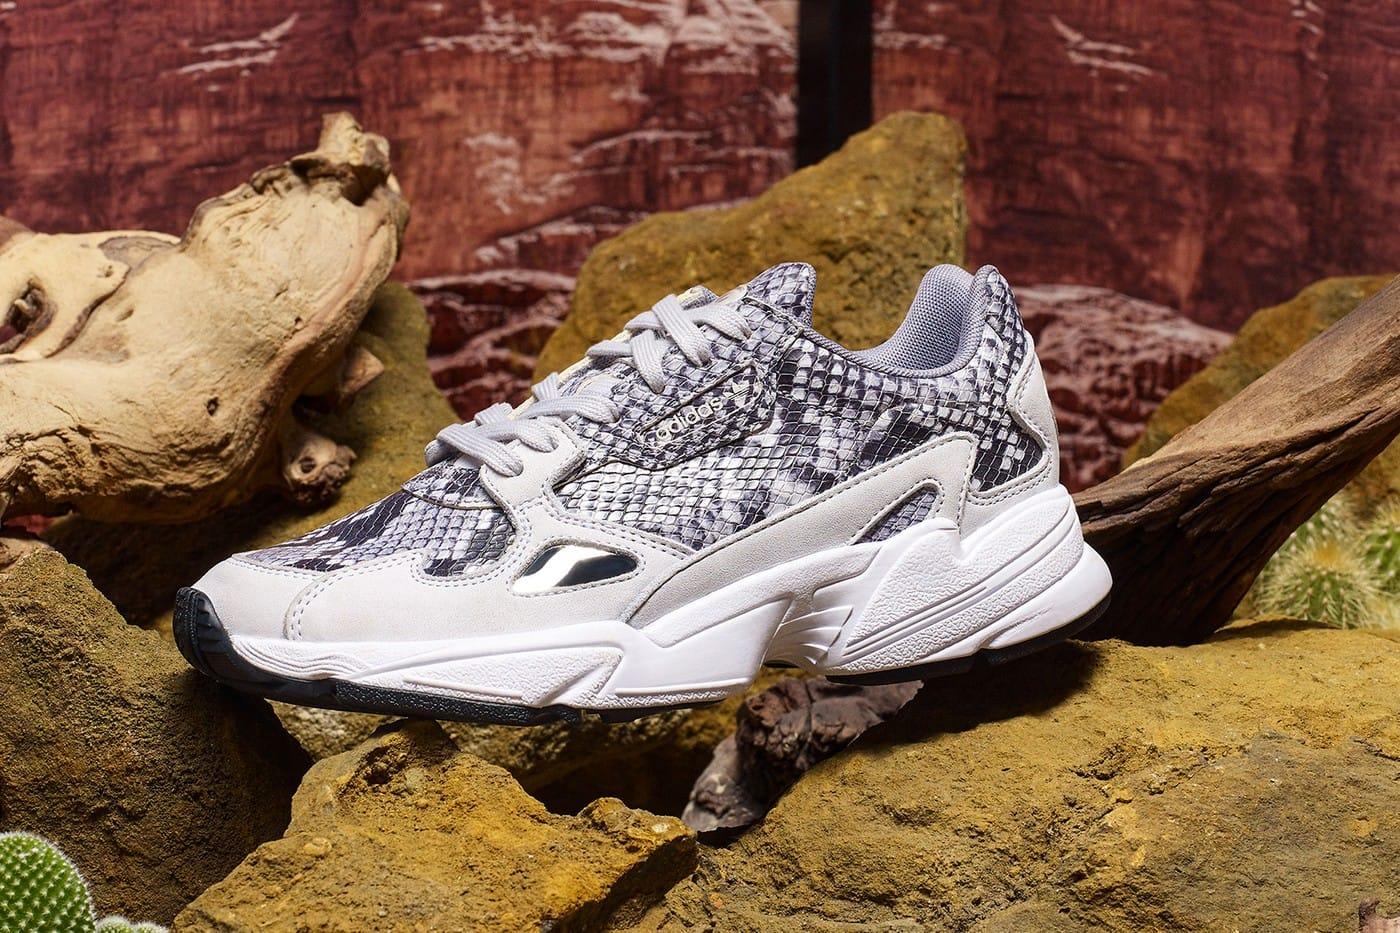 adidas Originals Snakeskin Sneaker Pack